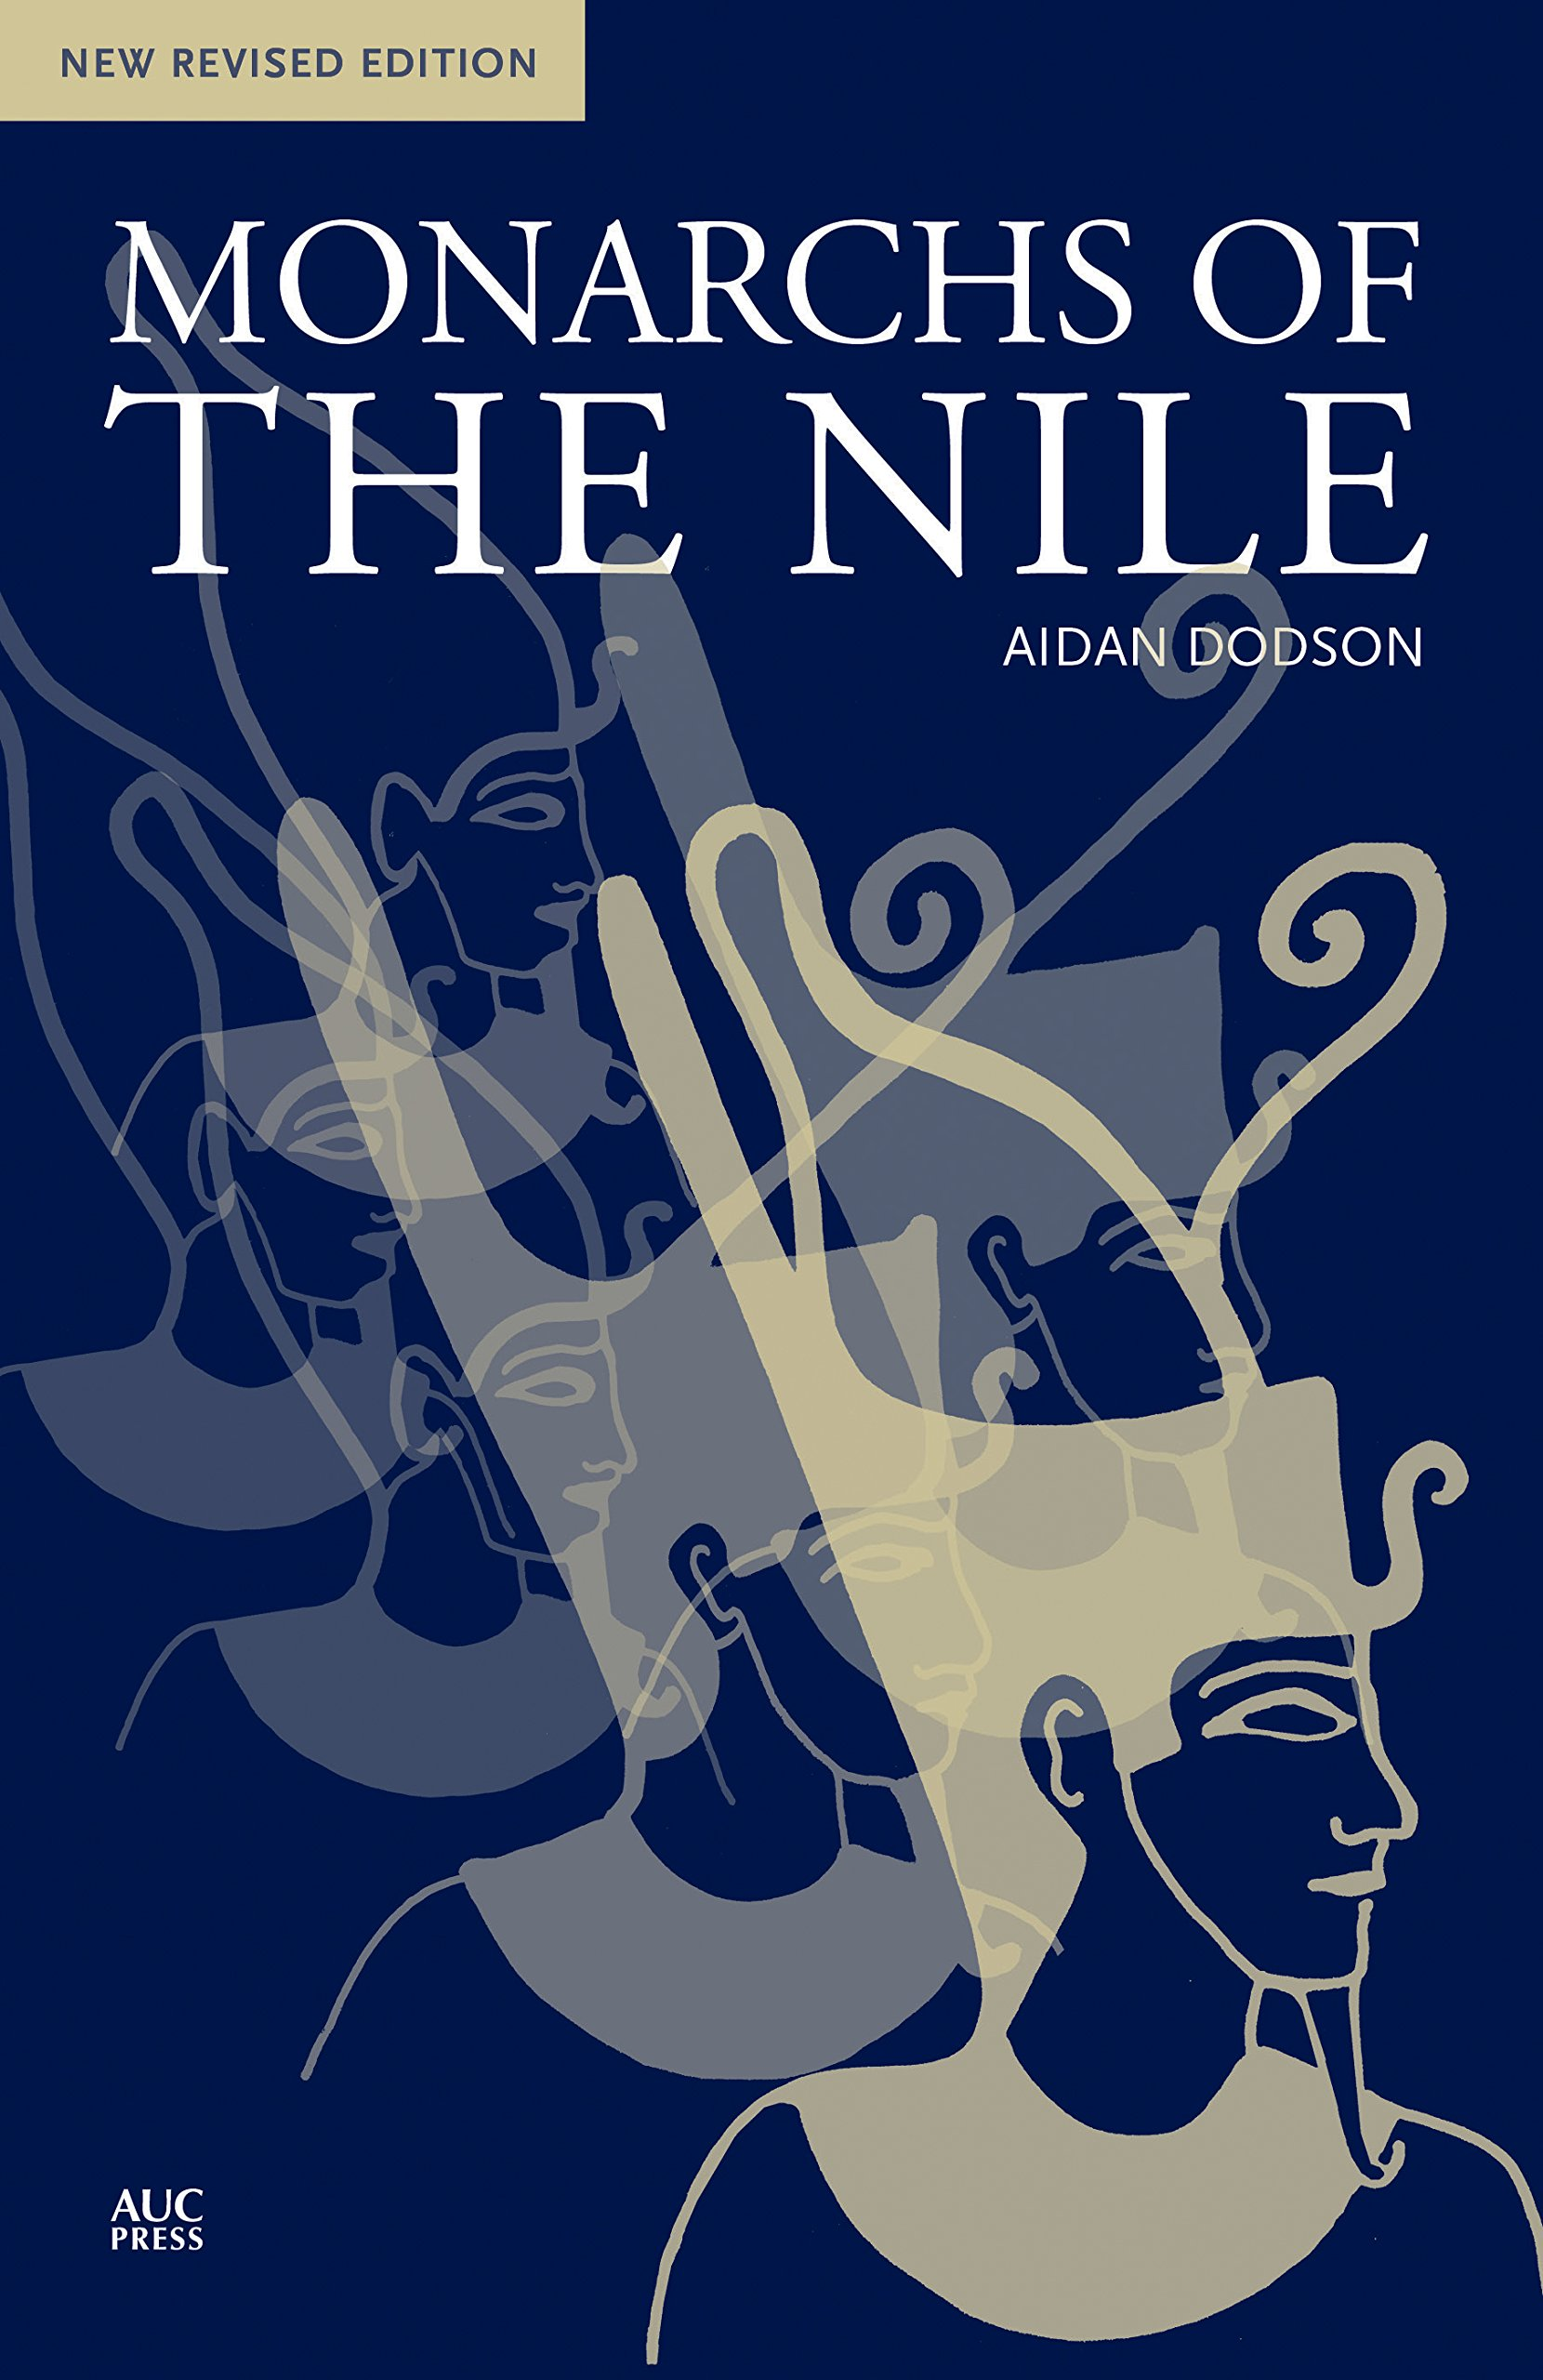 Monarchs of the Nile: New Revised Edition: Amazon.co.uk: Aidan Dodson:  9789774167164: Books